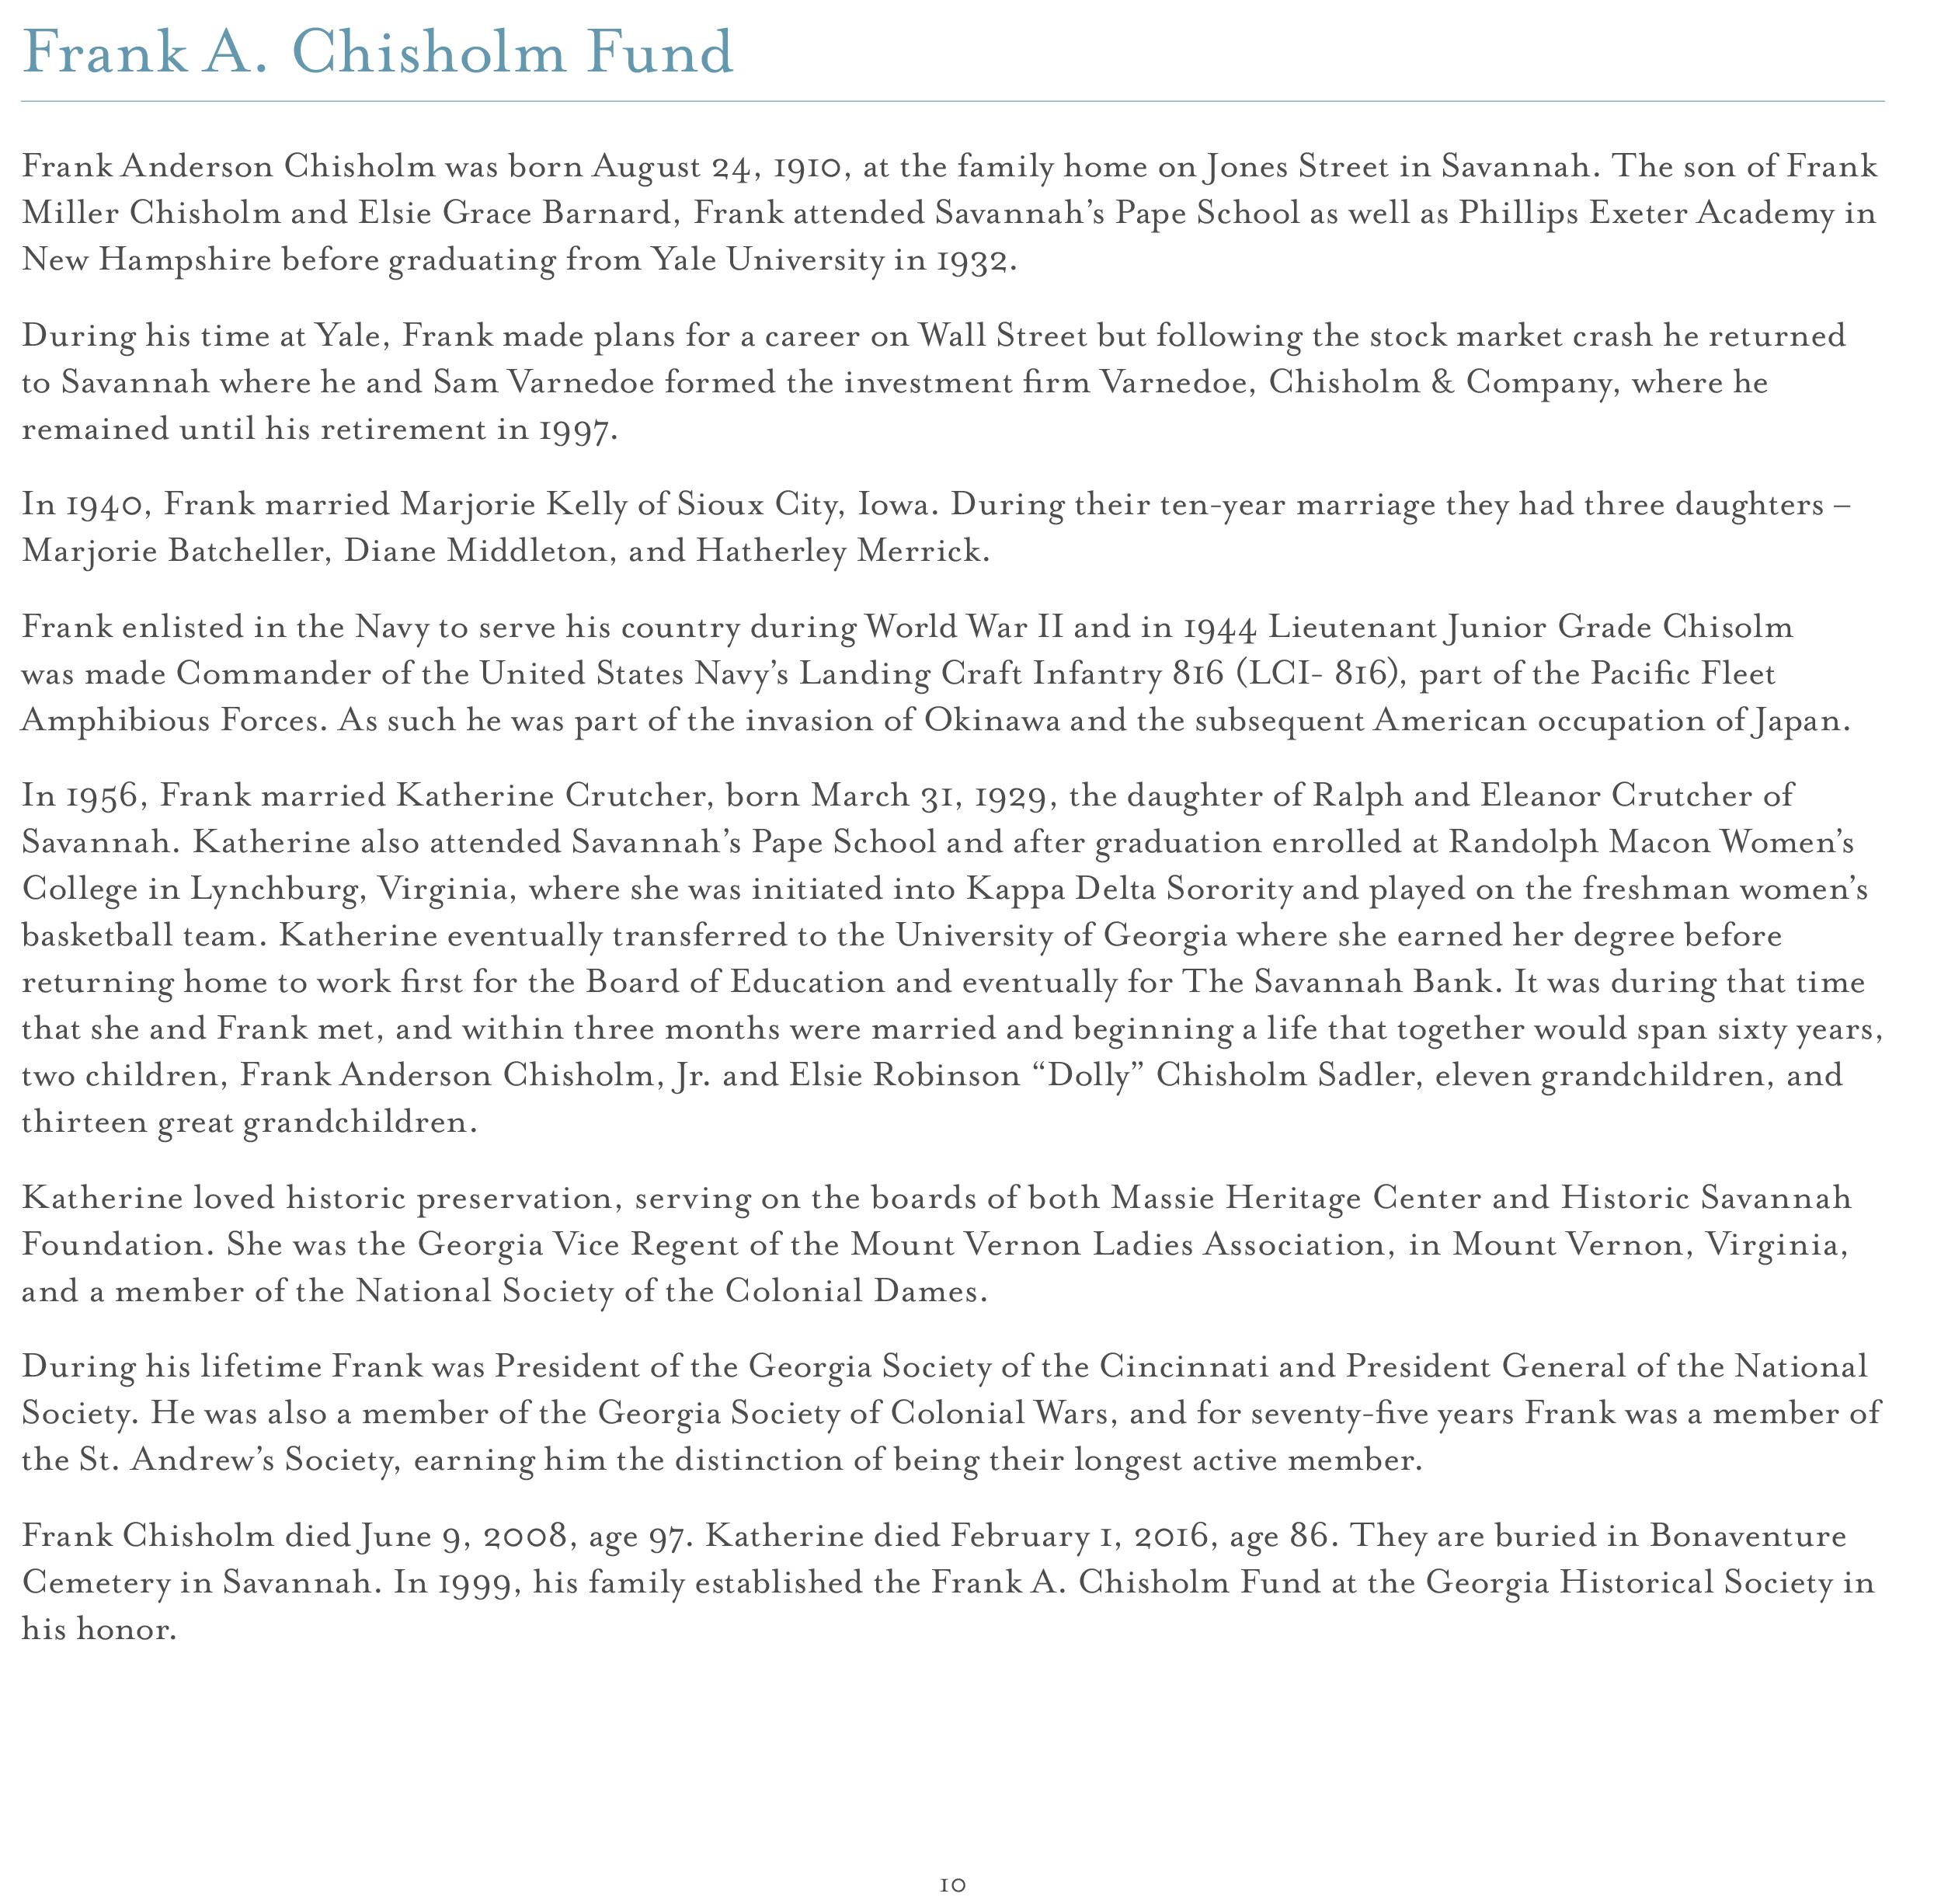 Endowment Campaign – Georgia Historical Society